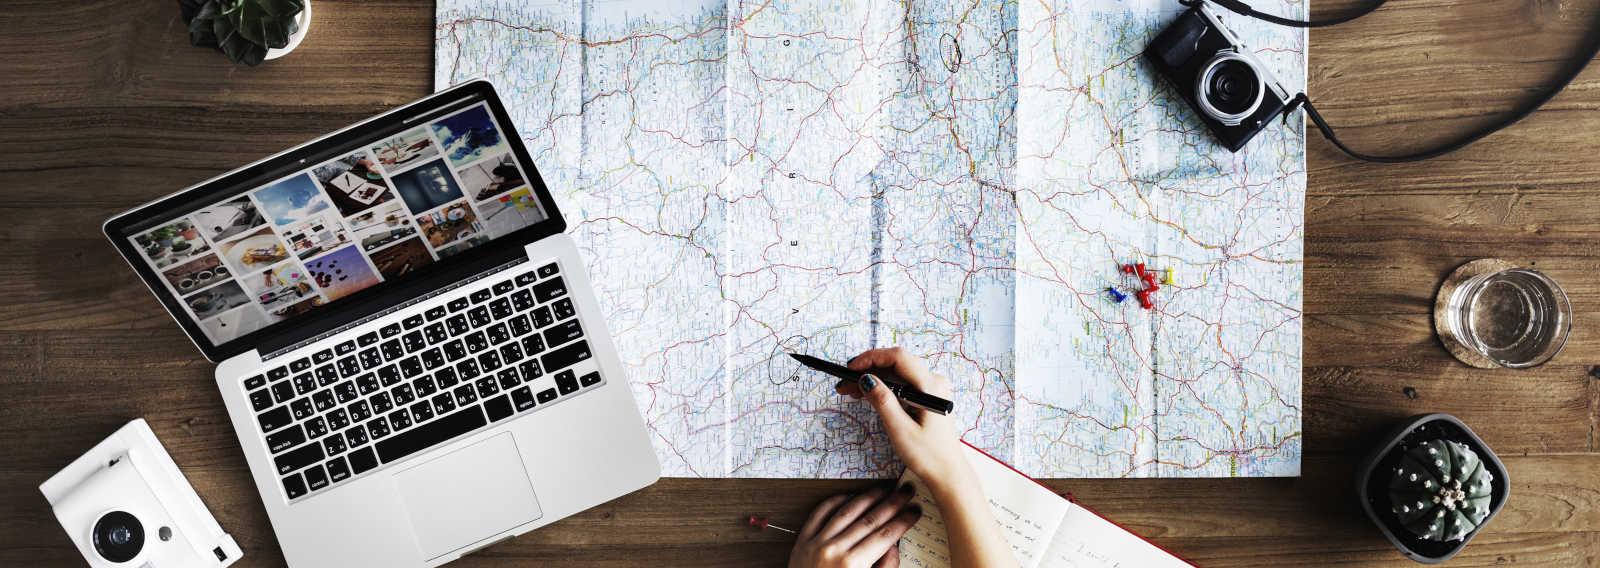 viaggi vacanze online bergamo